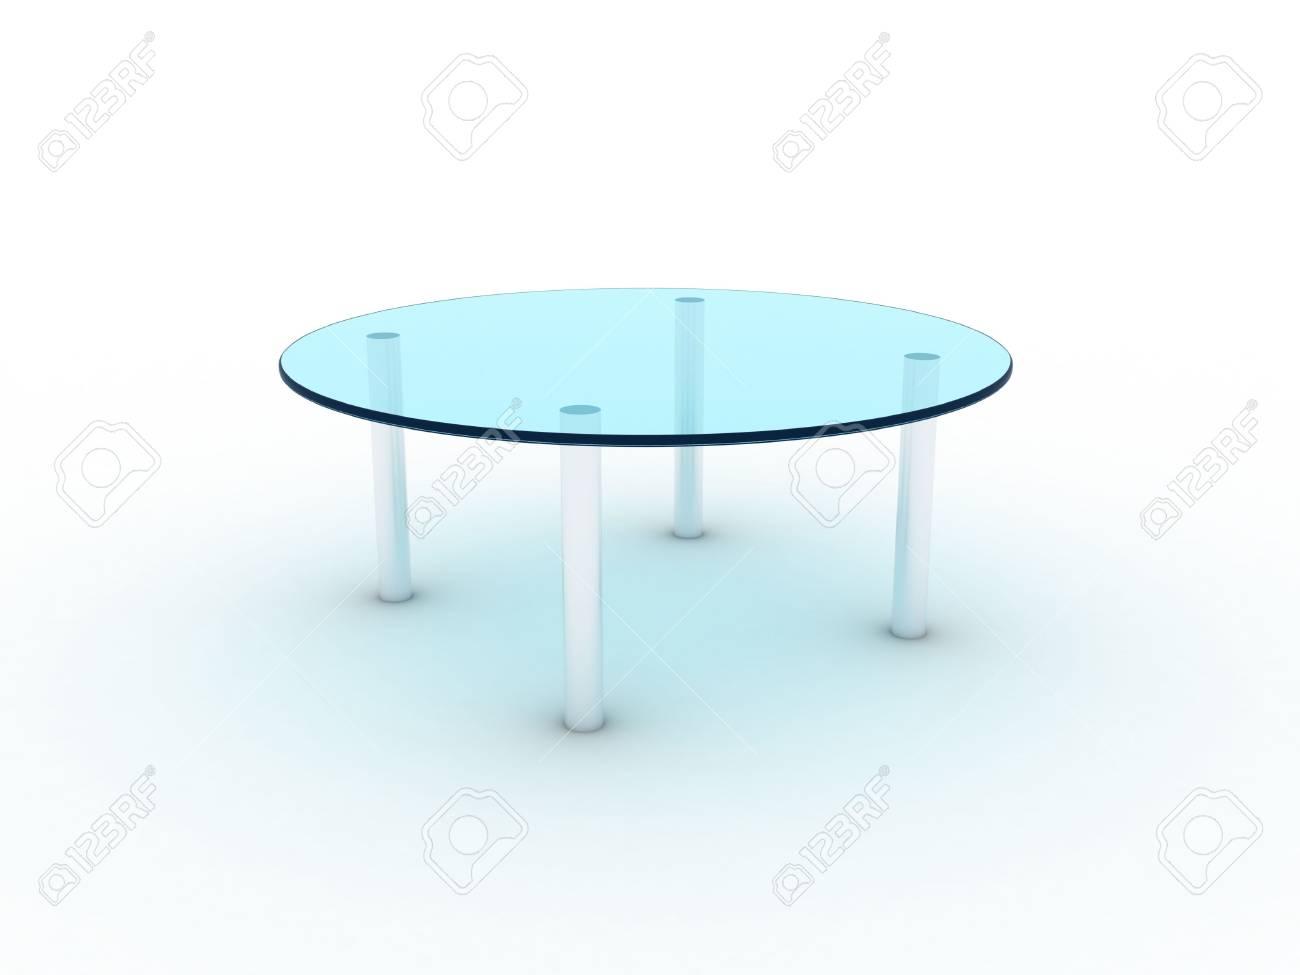 Illustration of a glass table on metal legs Stock Illustration - 7301366